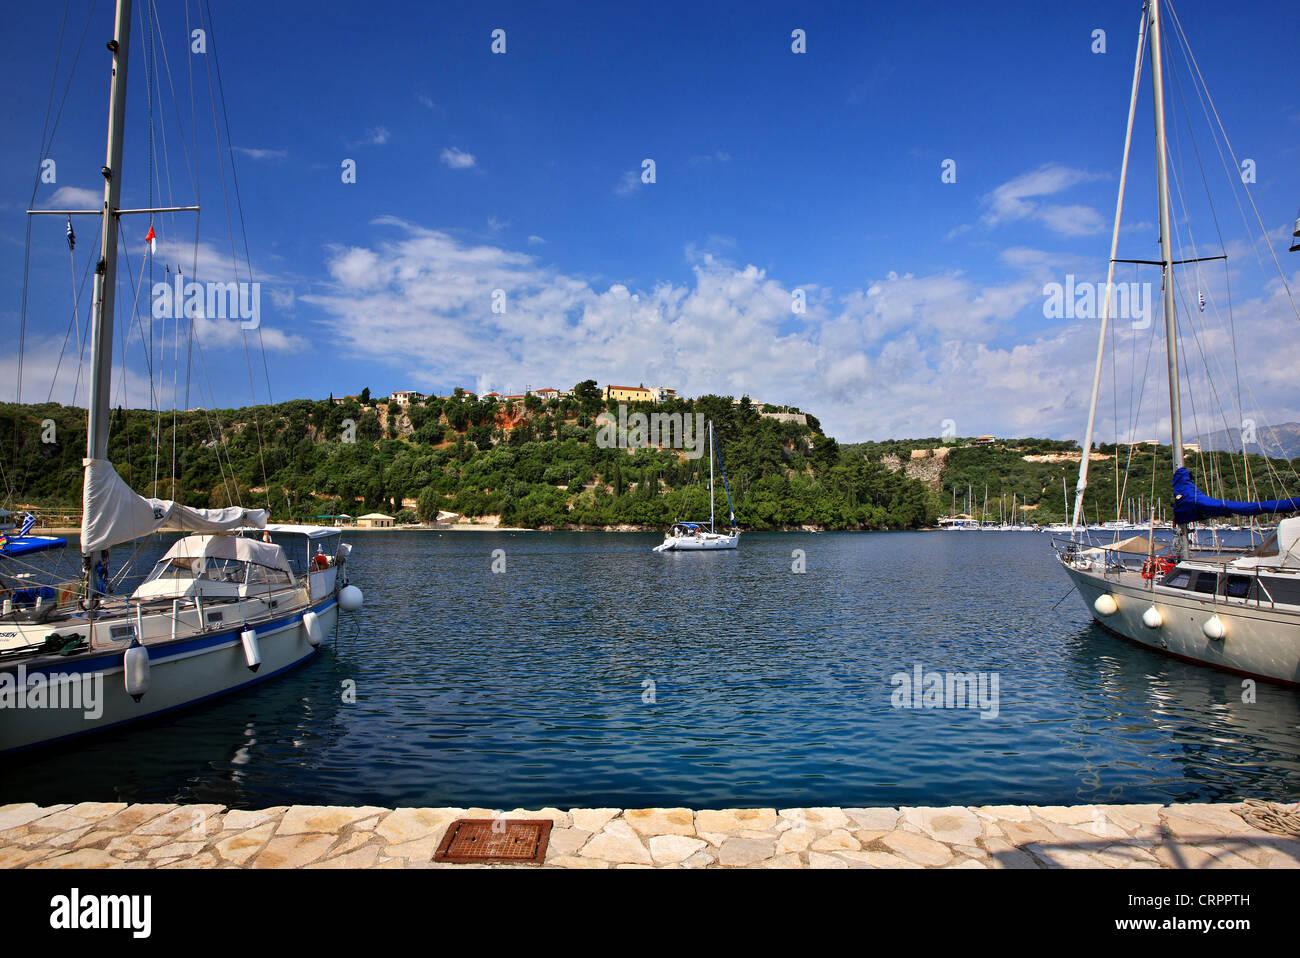 Yachts at the marina in Spilia bay, close to Spartochori village, Meganisi island (Lefkada prefecture), Ionian sea, Stock Photo